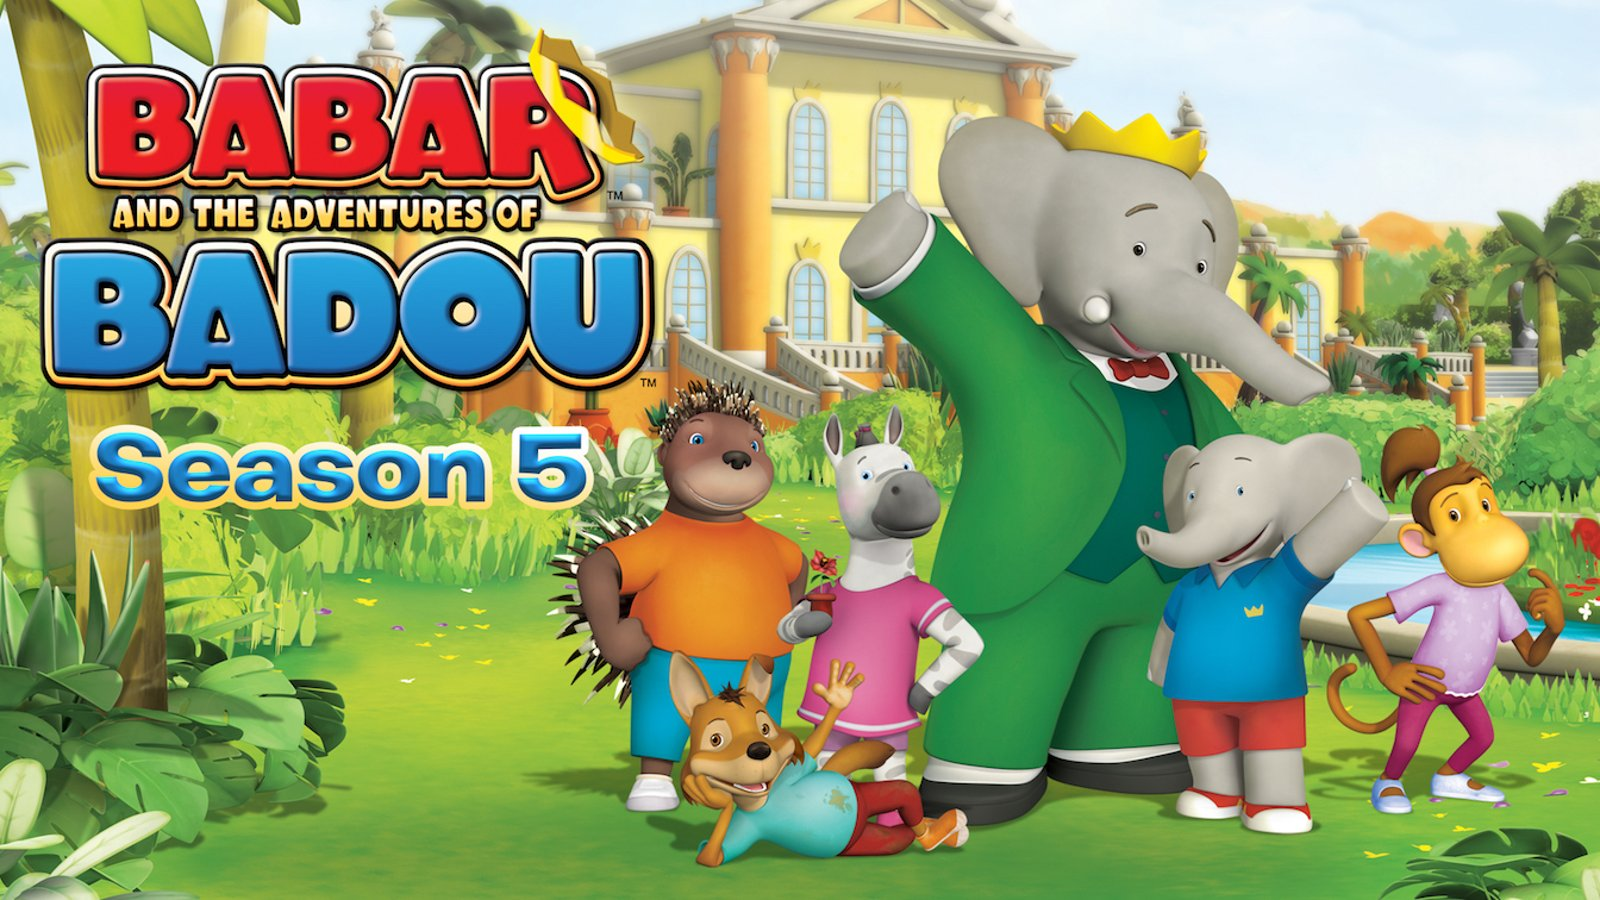 Babar and the Adventures of Badou Season 5